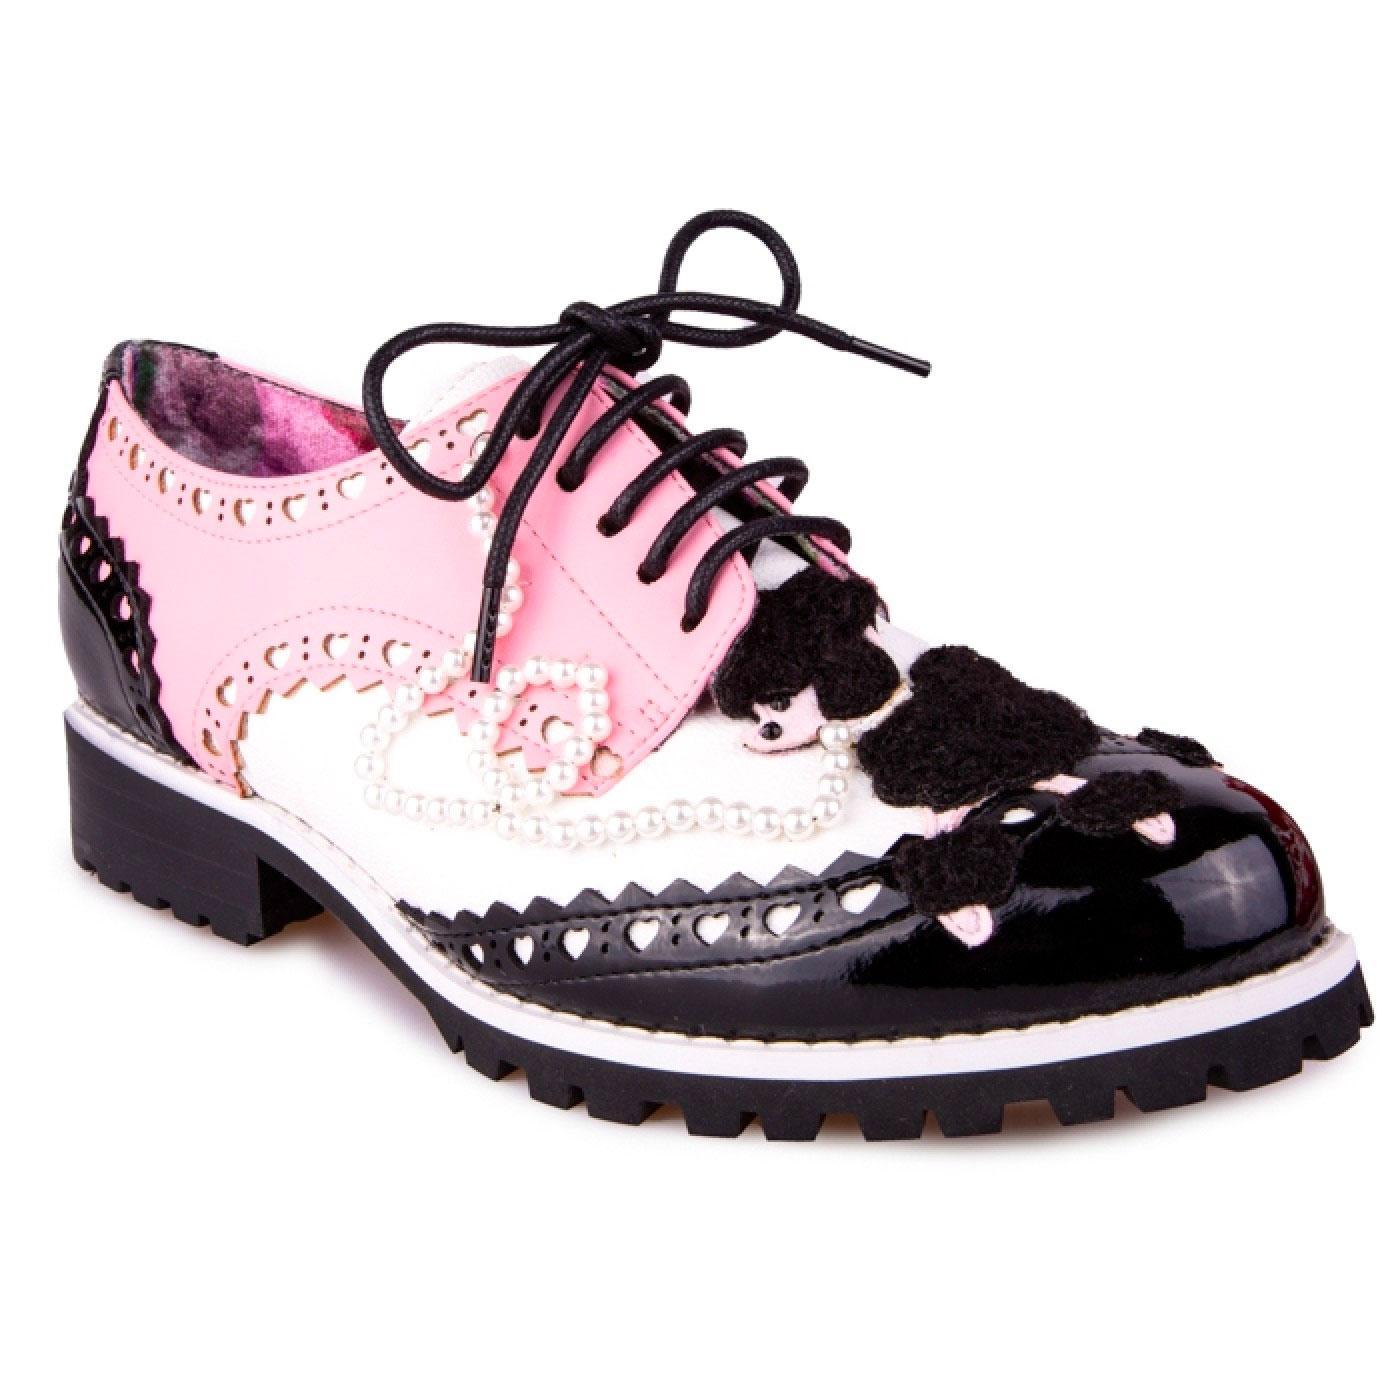 Sockhop Sweetie IRREGULAR CHOICE 50s Brogue Shoes